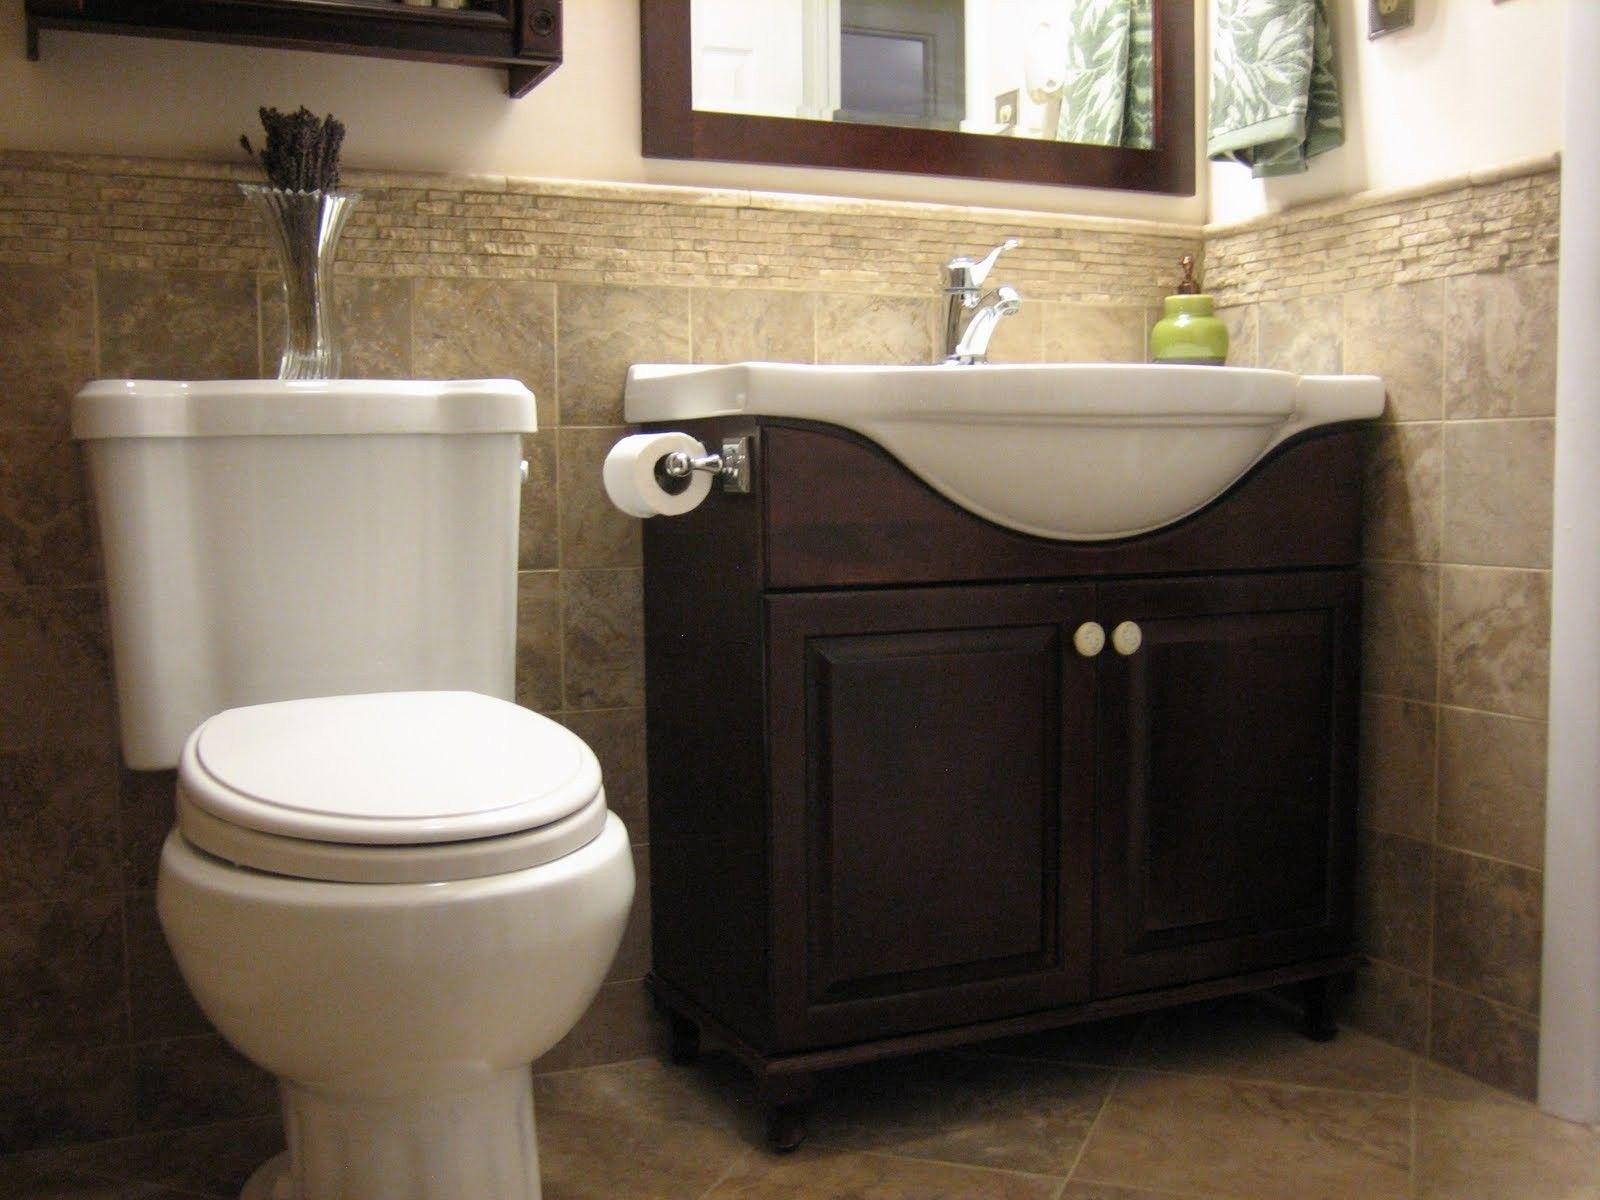 Half Bathroom Ideas 2019 Bath Bathroom Bathroomideas Bathroomdesign Bathroomremodel Small Half Bathrooms Half Bathroom Decor Half Bathroom